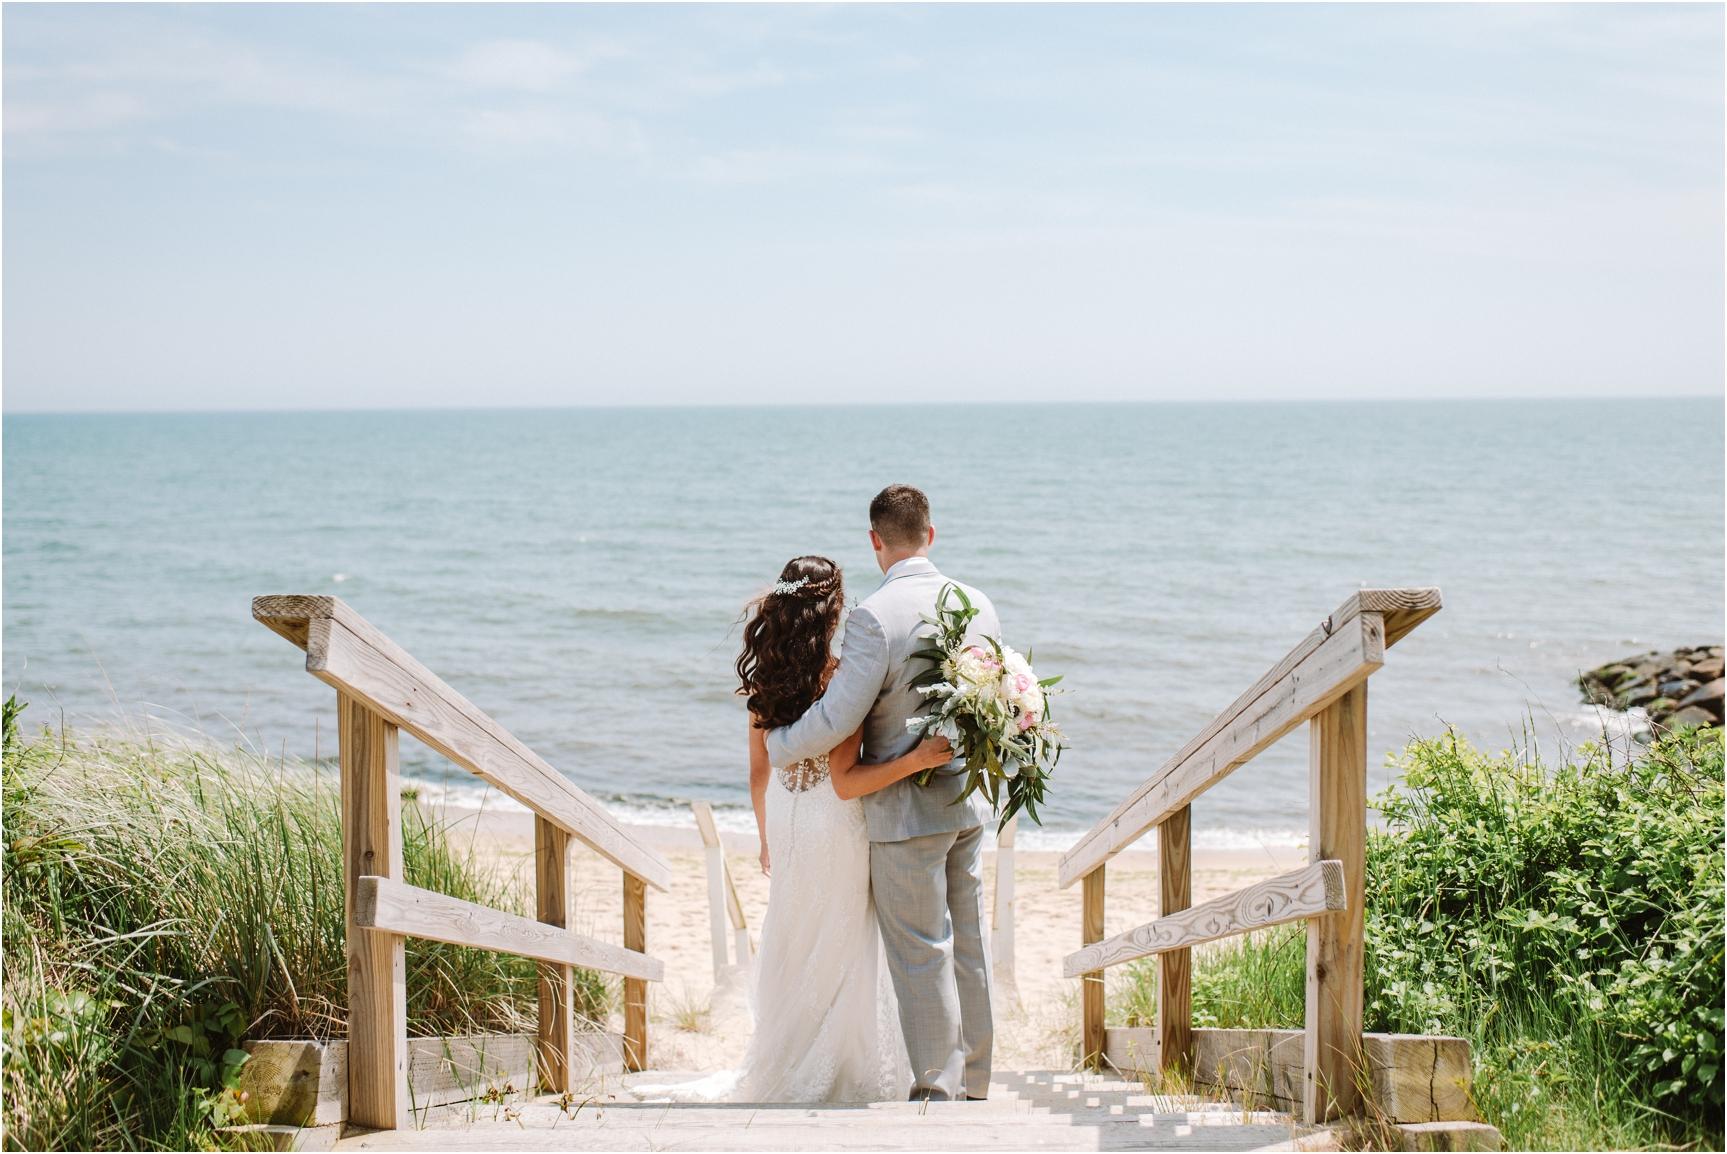 Sarah & Sam Pelham House Cape Cod Wedding Photographer-54.jpg